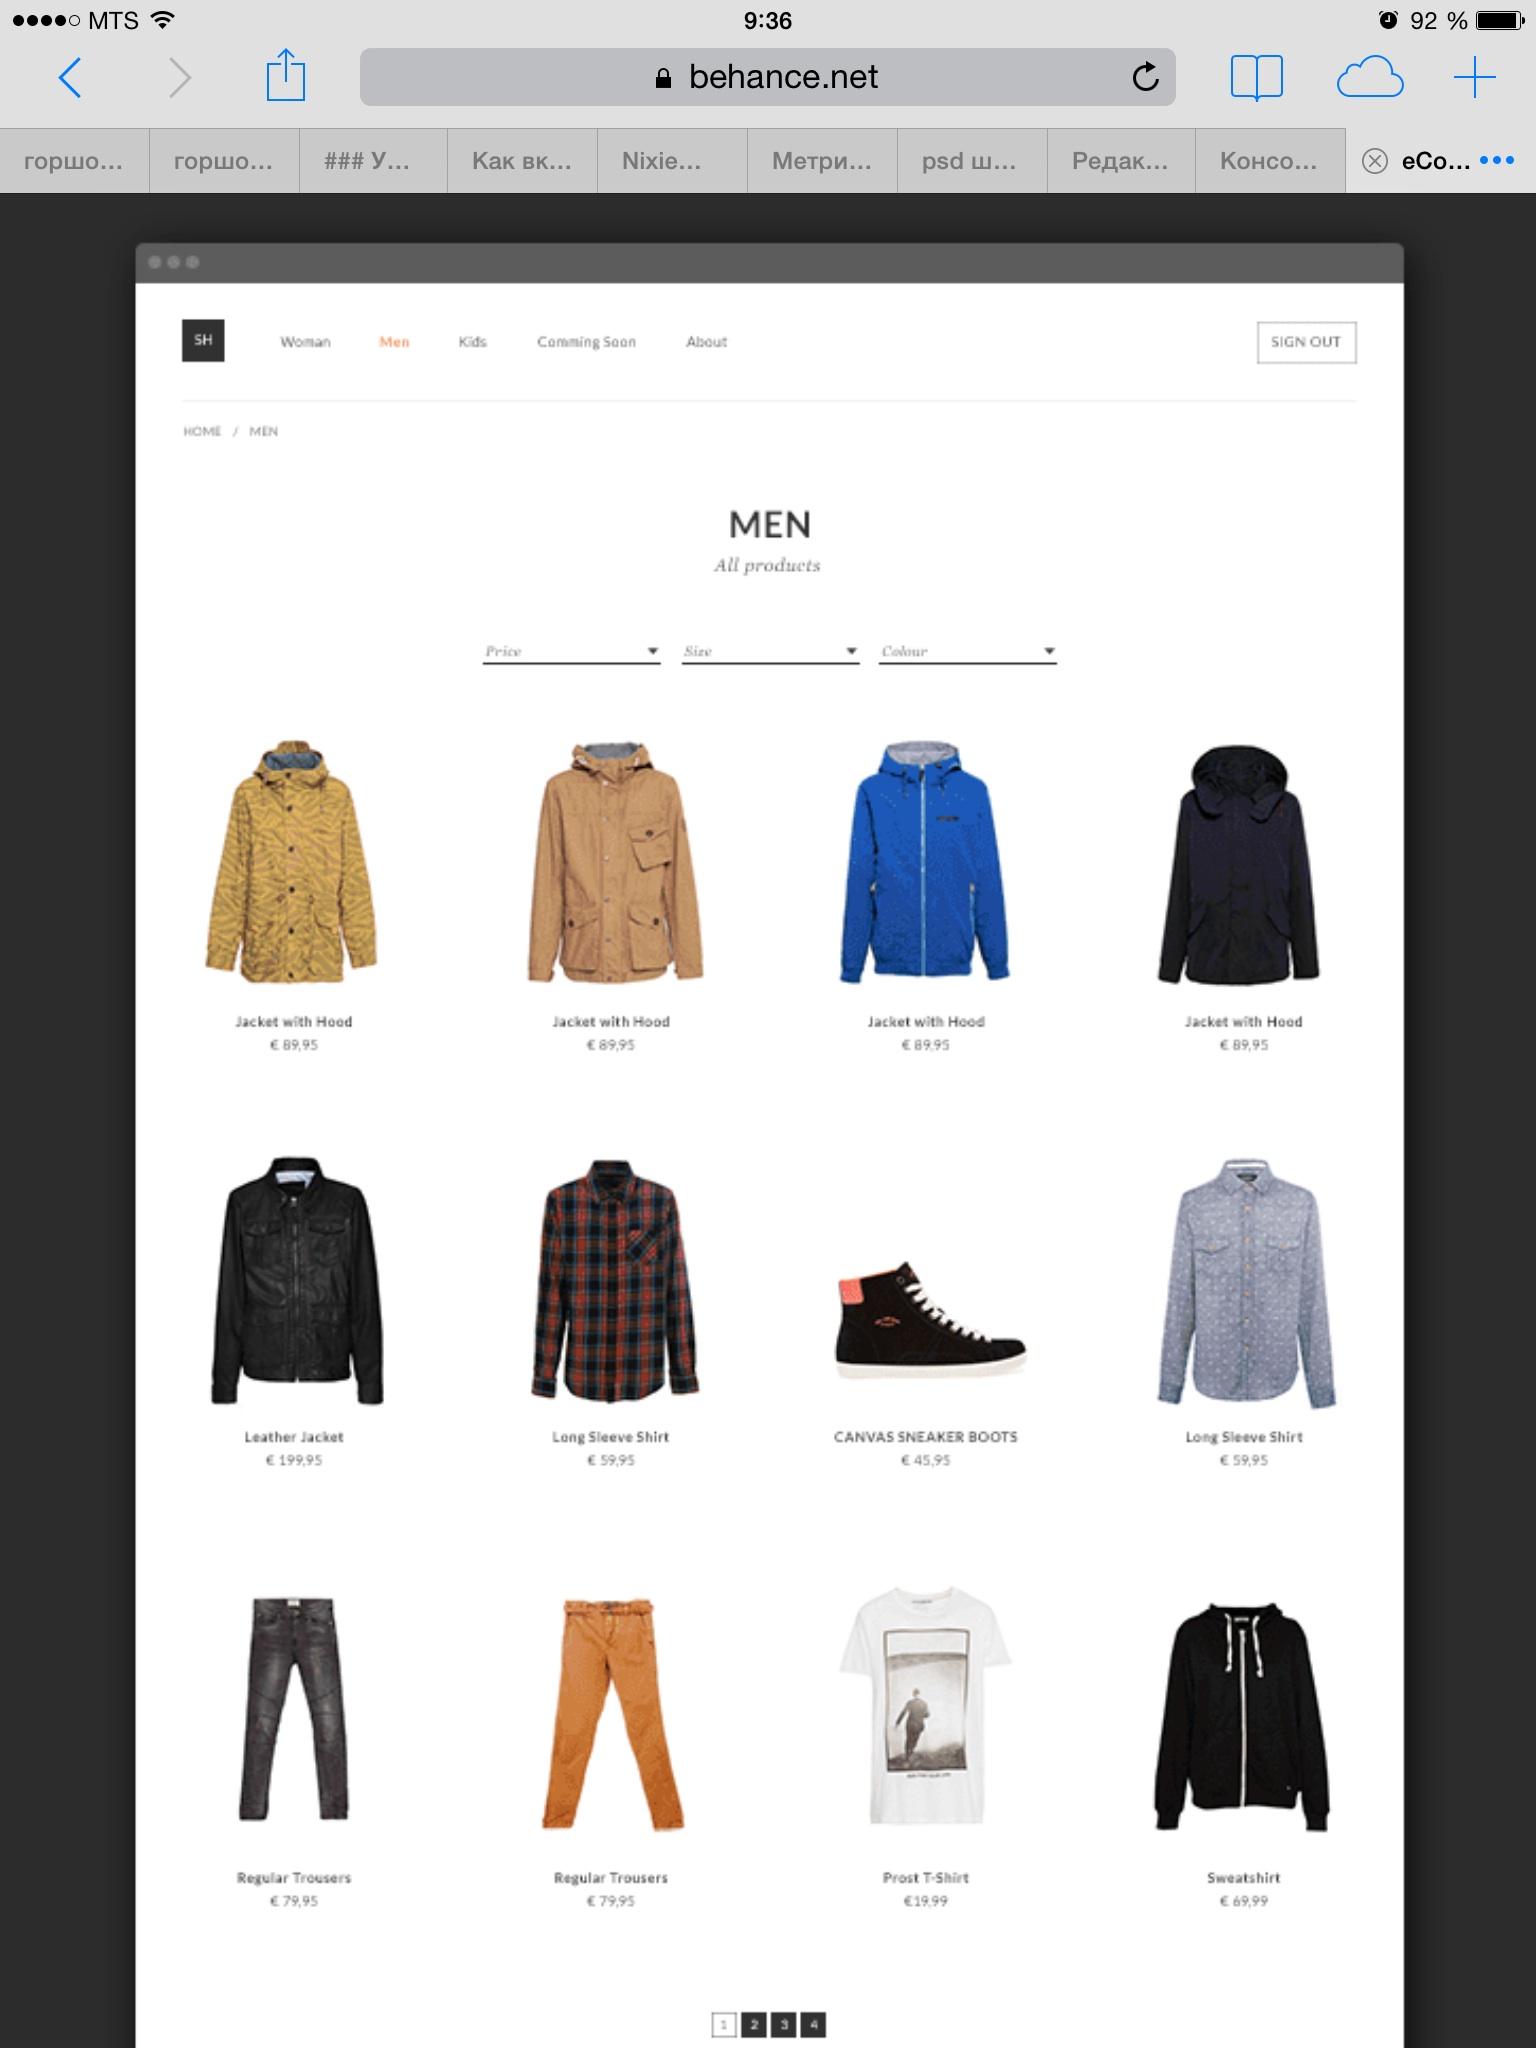 Psd шаблон интернет магазина скачать бесплатно free template e-commerce